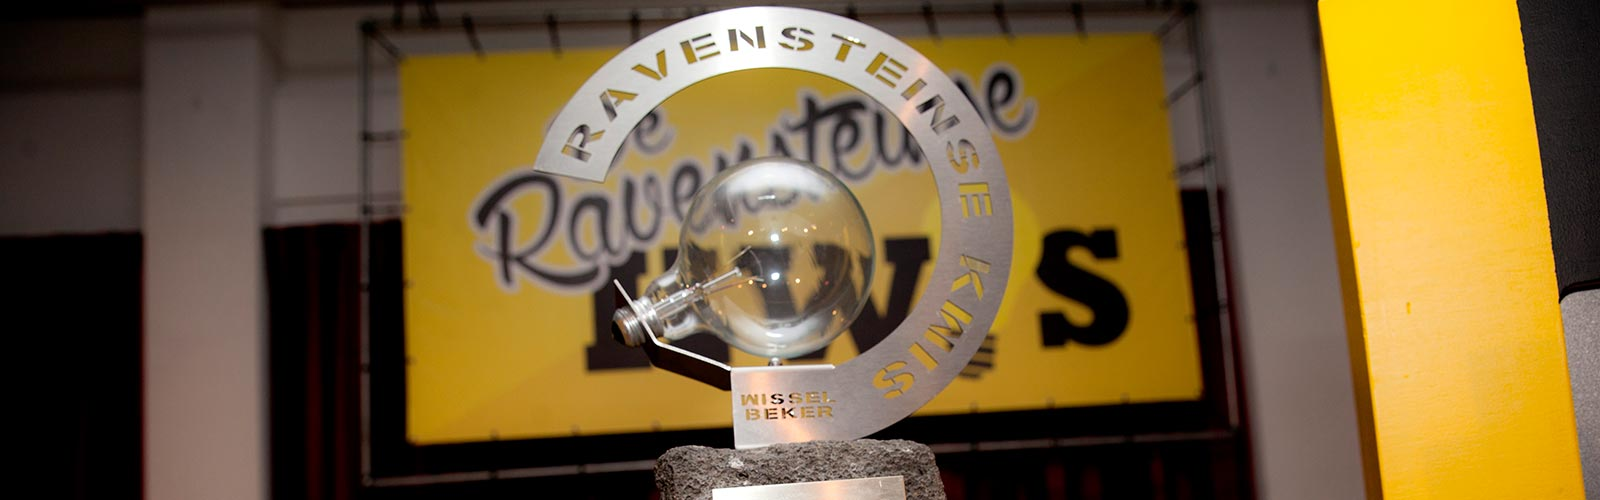 Ravensteinse-Kwis-2017_slide5